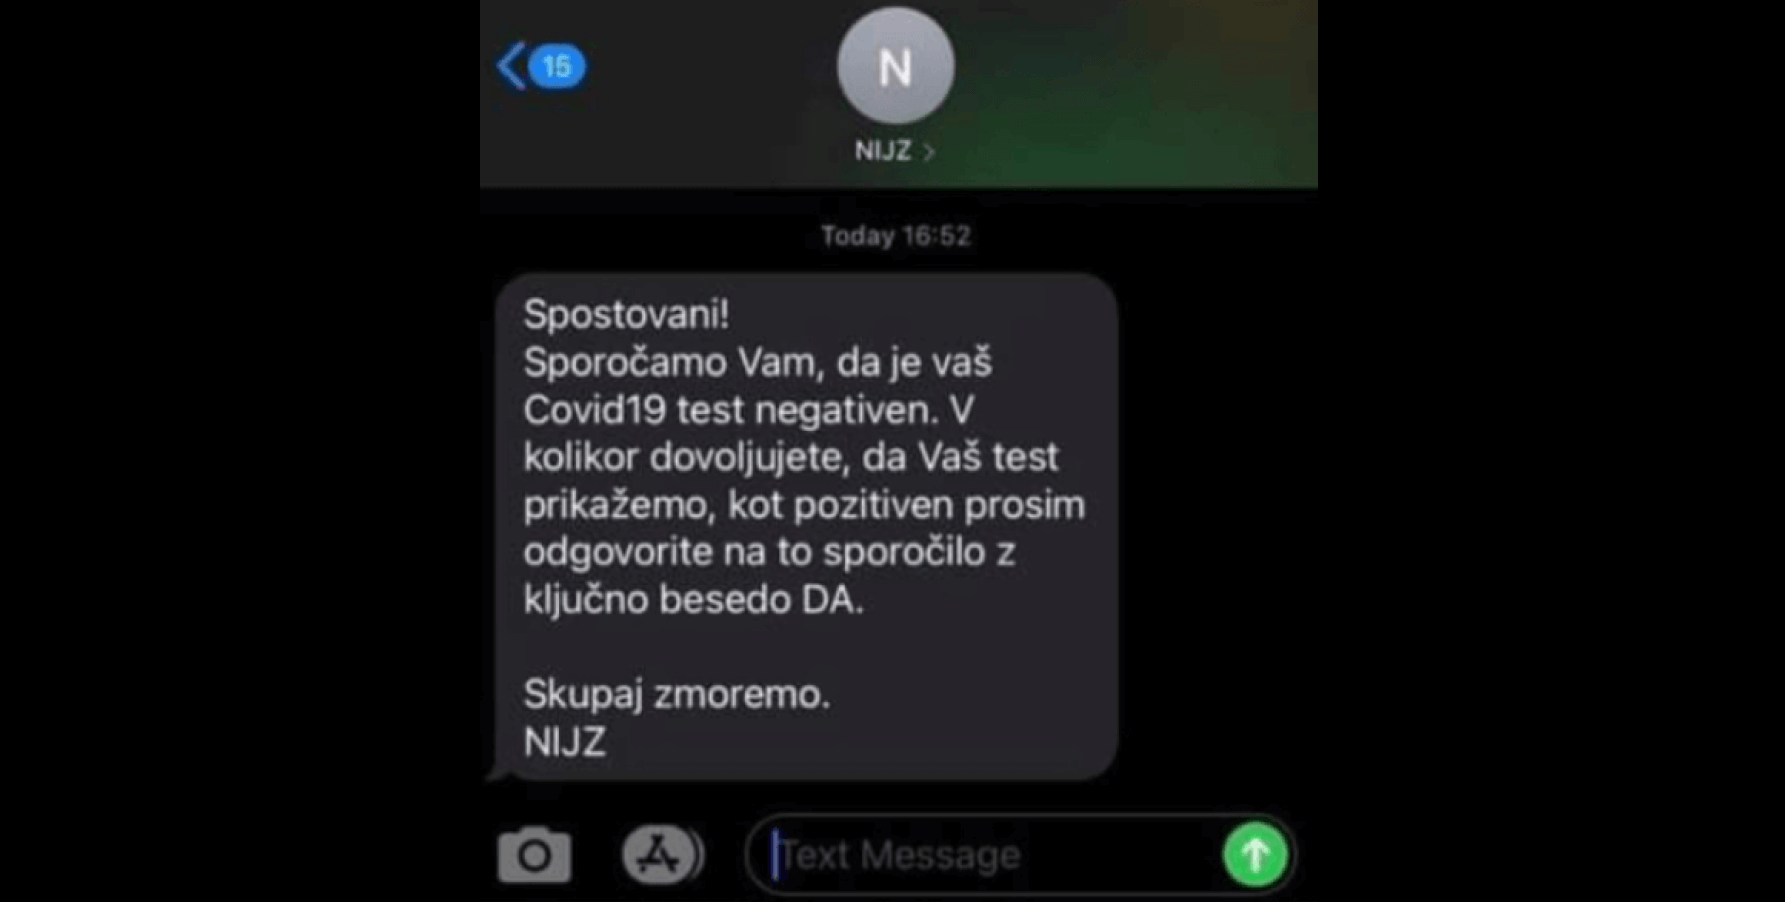 Lažni SMS, ki nakazuje, da naj bi bili testi lažno pozitivni